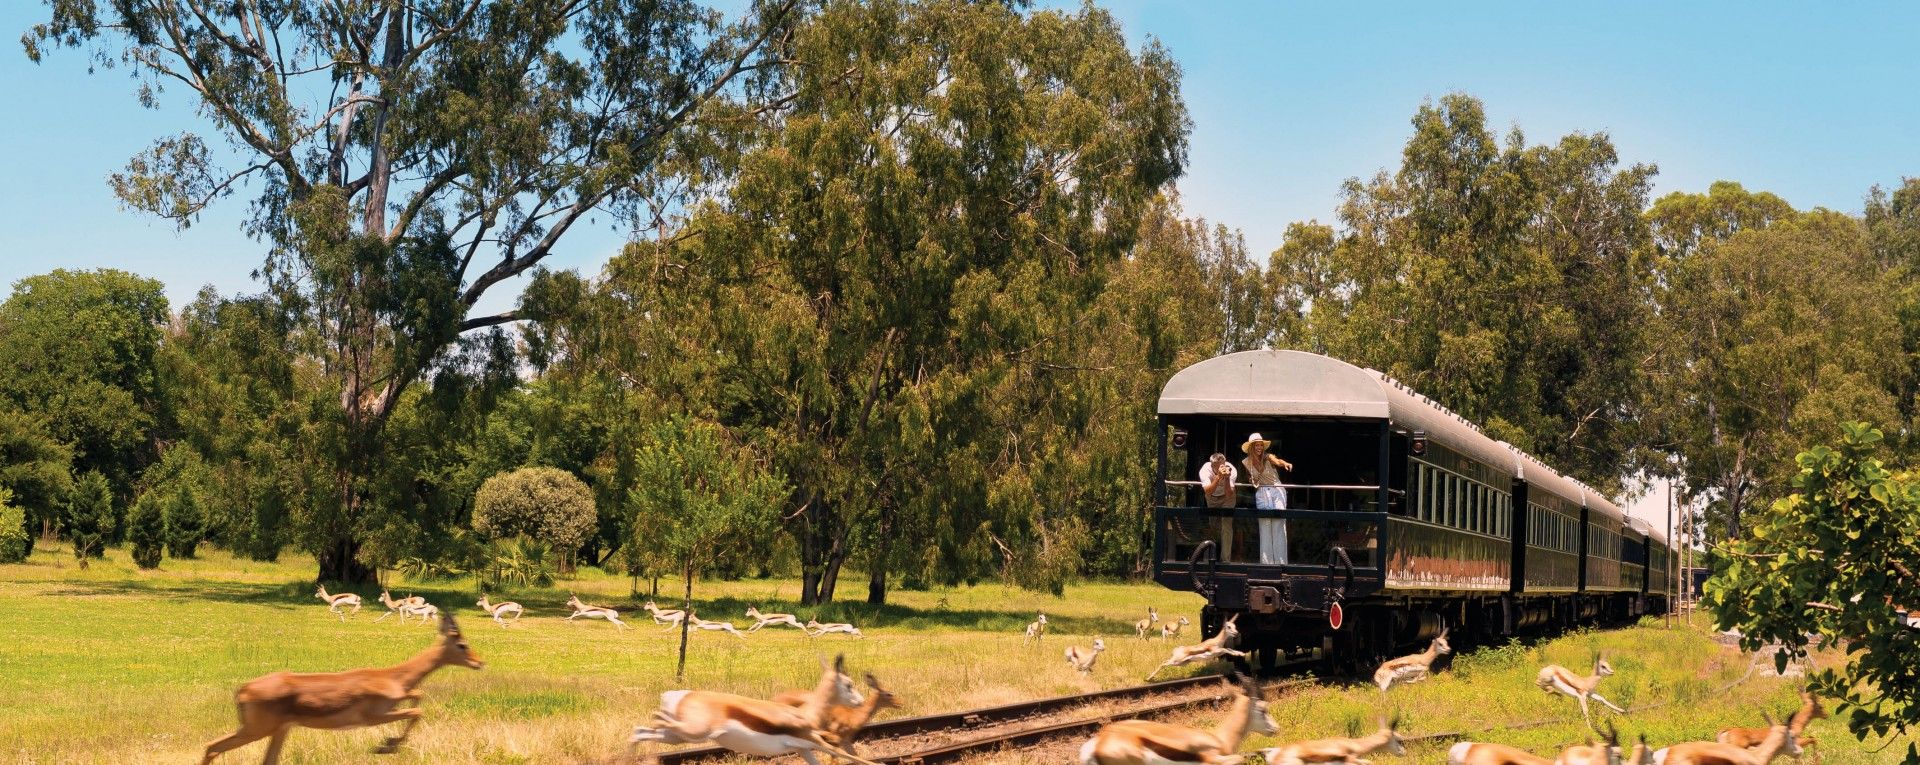 Кейптаун (3н) - поезд Rovos Rail (2н) - Йоханнесбург (1н) - Парк Крюгера (2н) - Панорамный путь (1н);